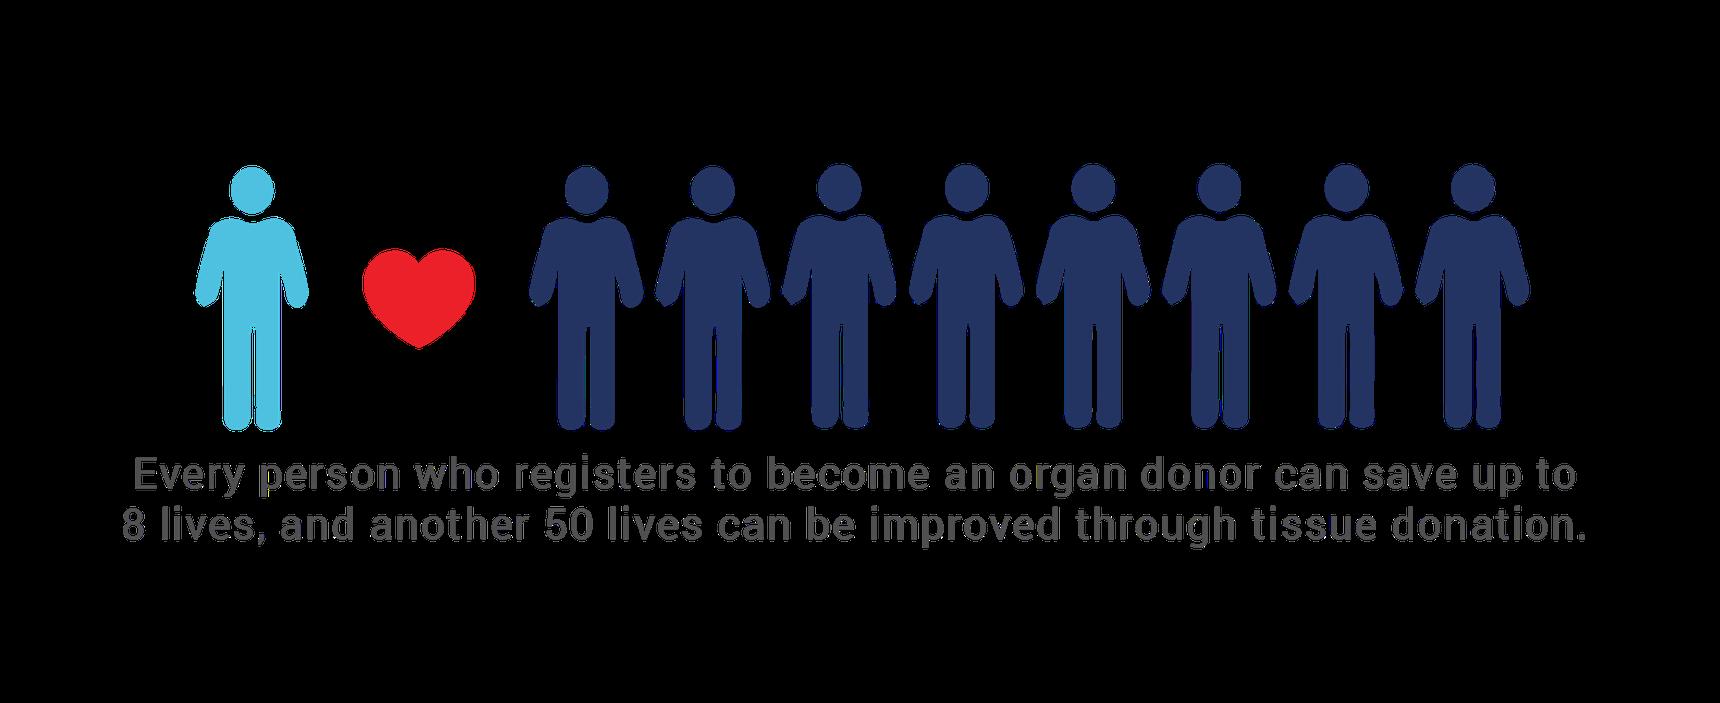 liveonny be an organ donor